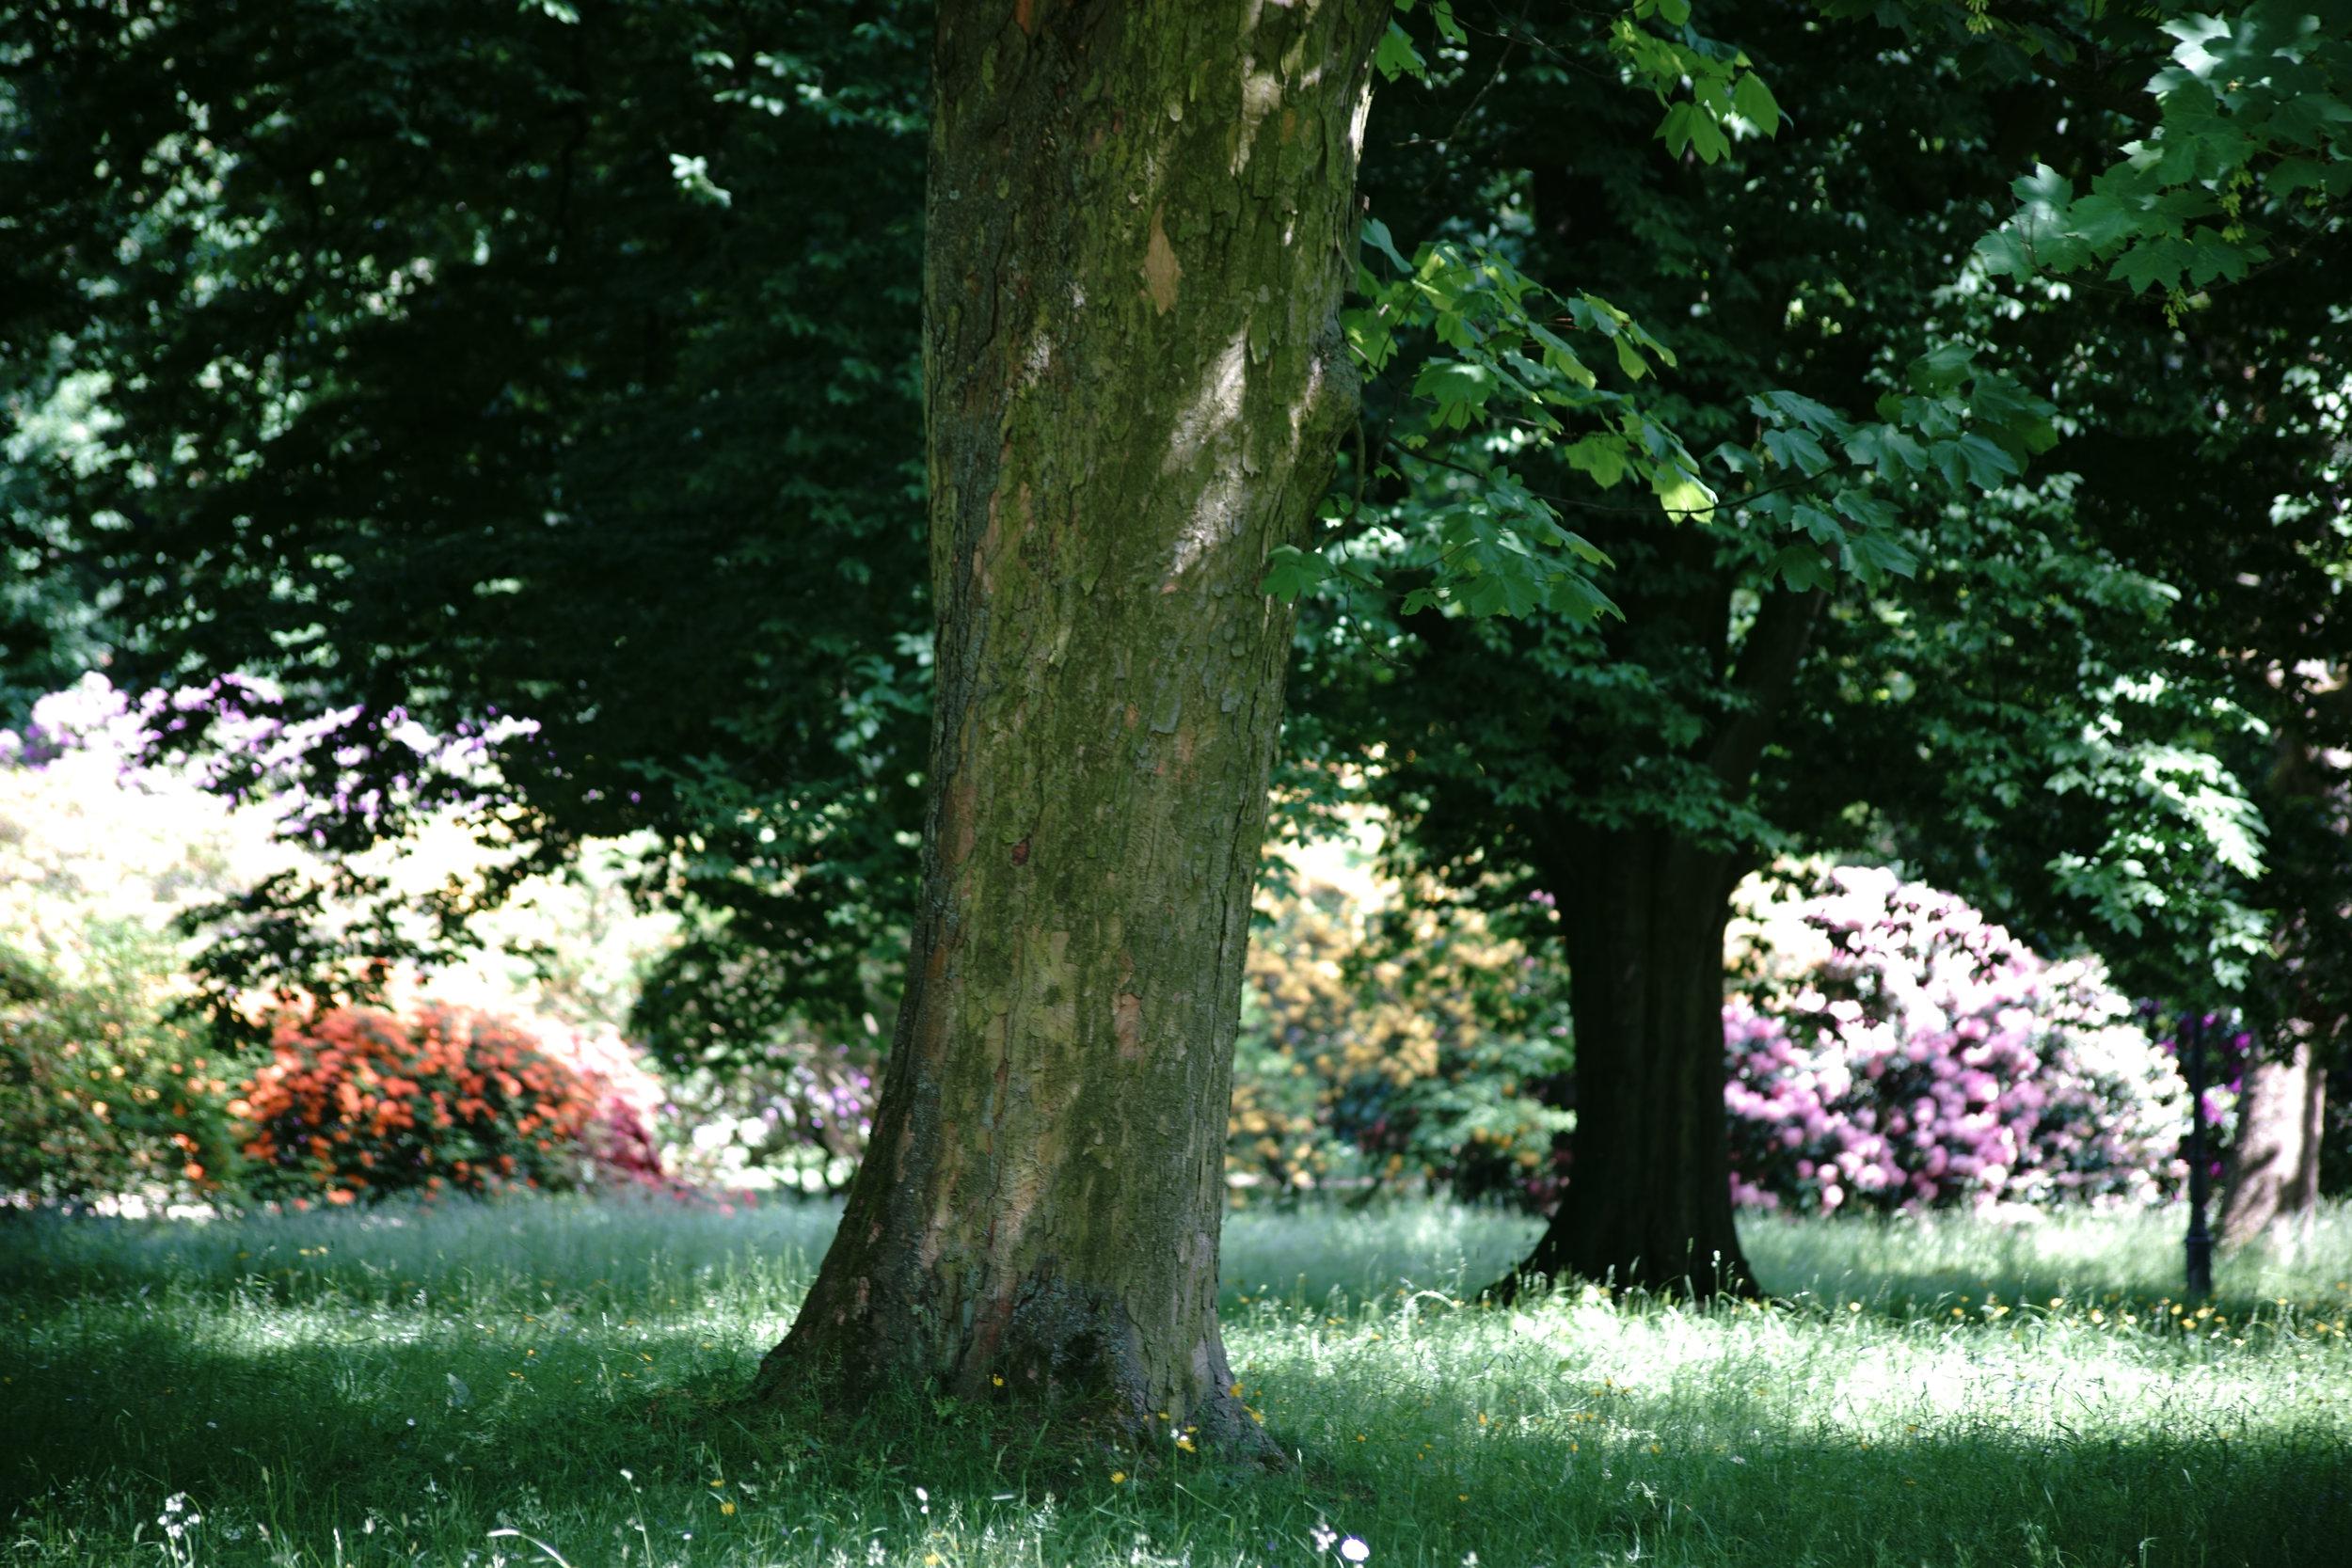 Shade Tolerant Trees and Shrubs